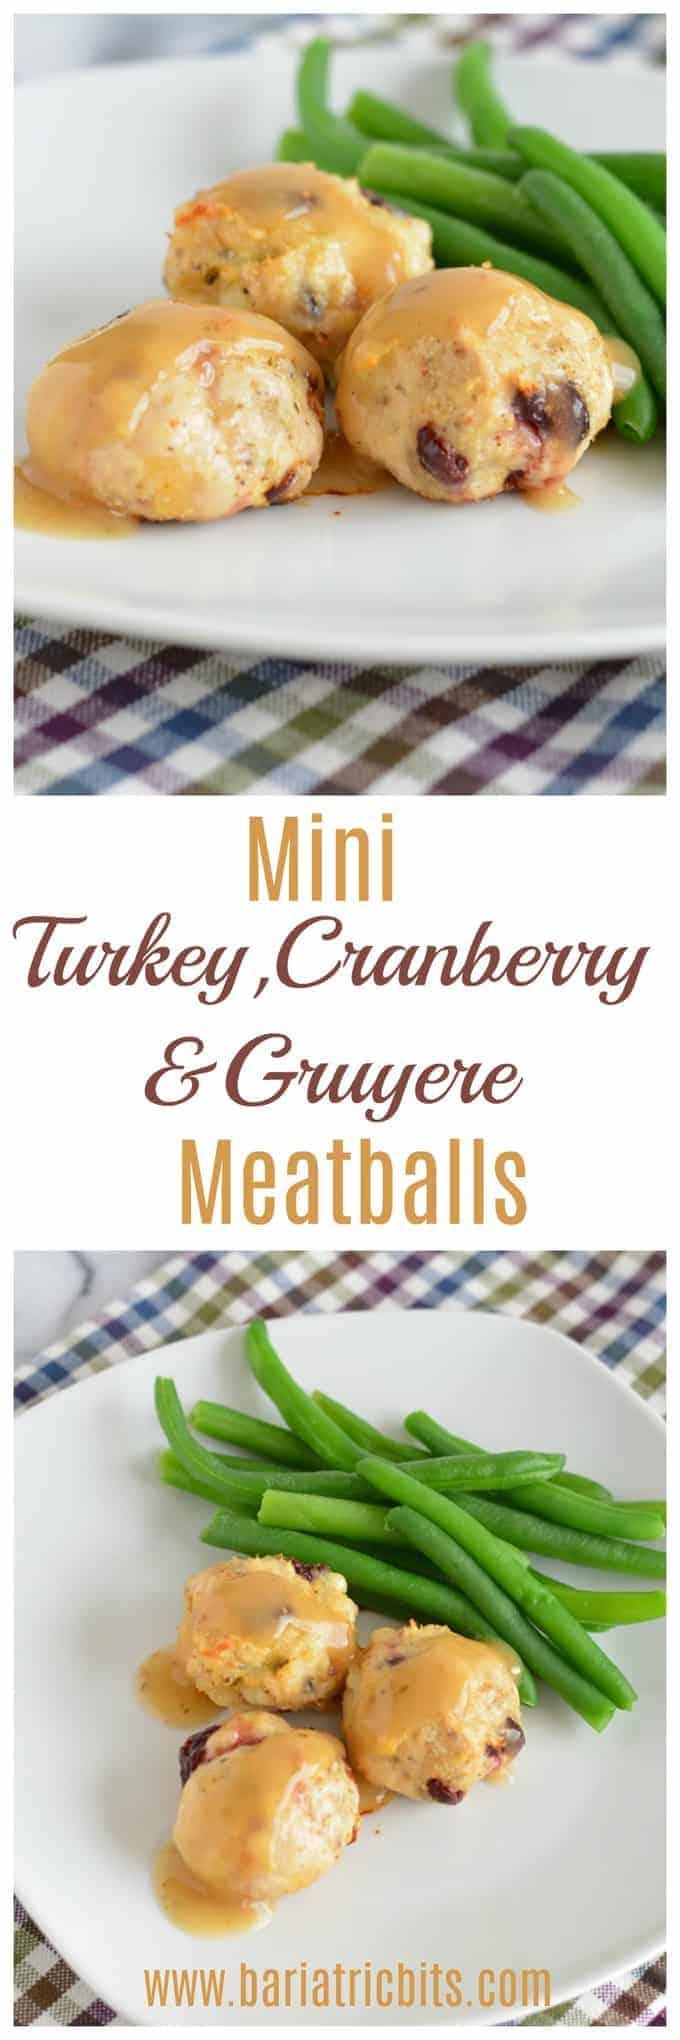 Cranberry, Sage, & Gruyere Turkey Meatballs